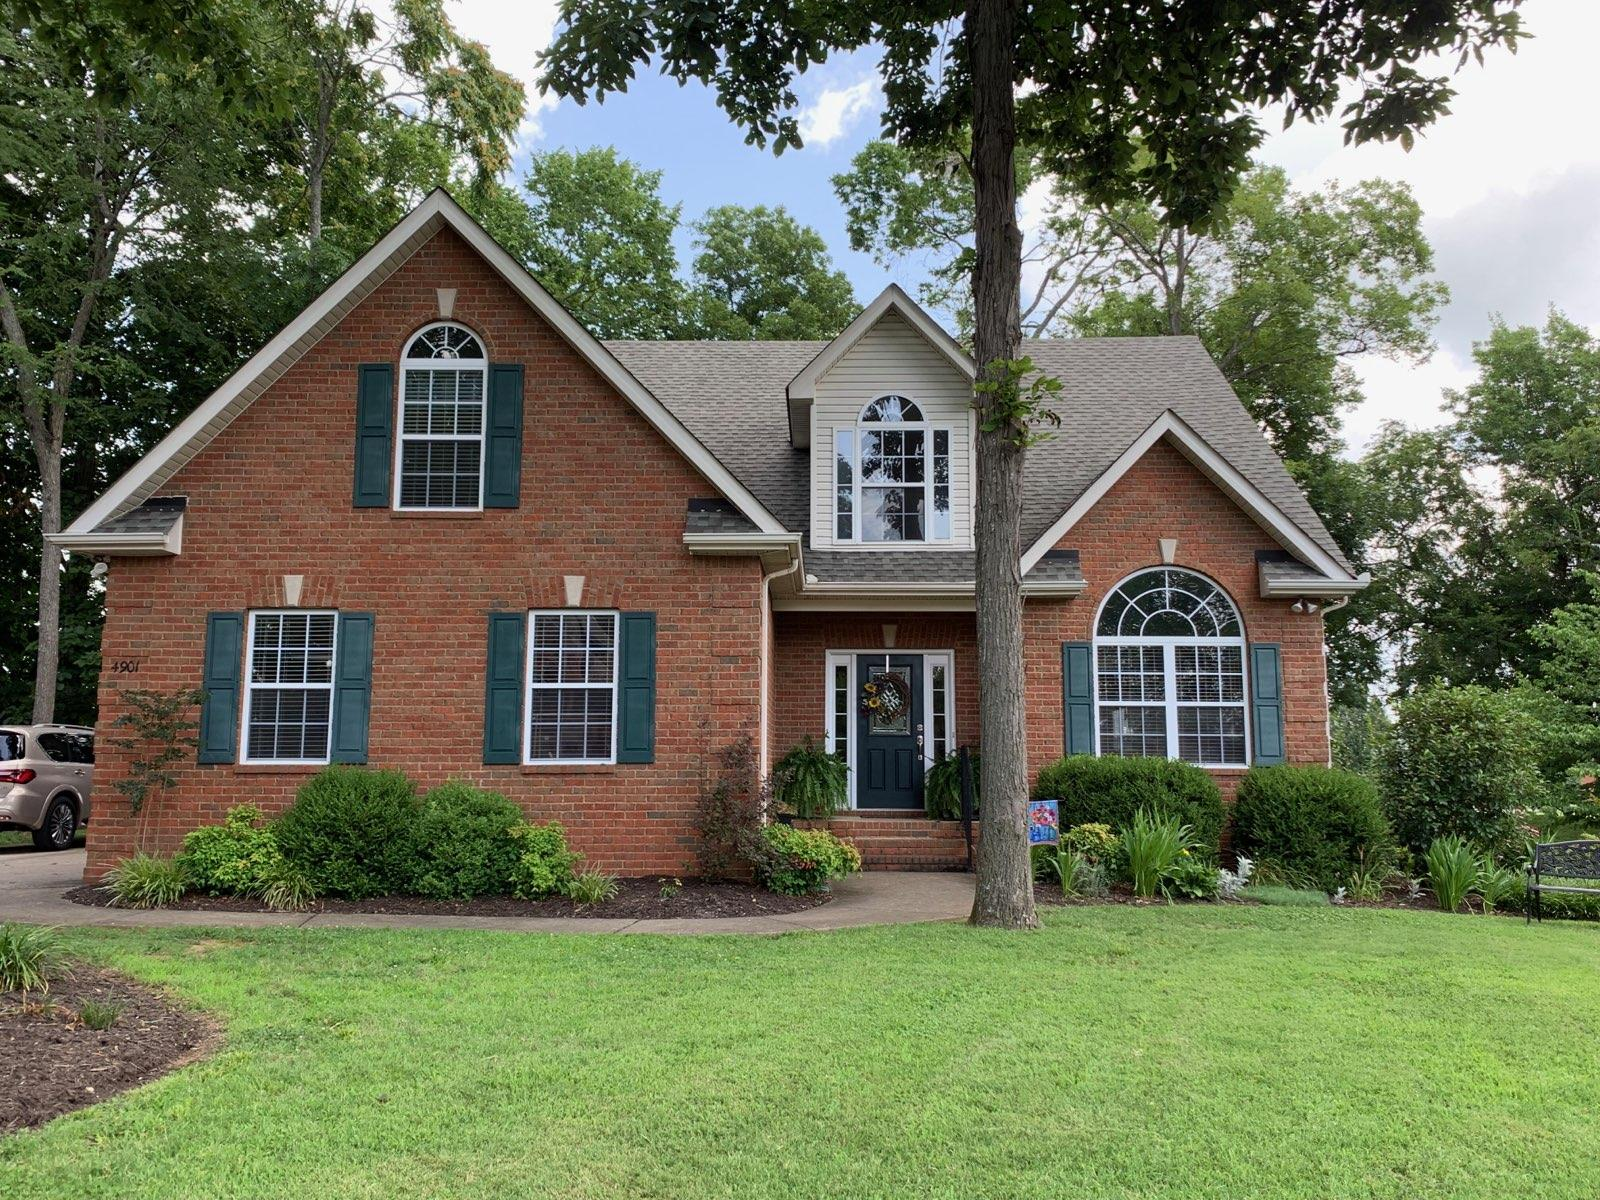 4901 Cally St, Murfreesboro, TN 37128 - Murfreesboro, TN real estate listing